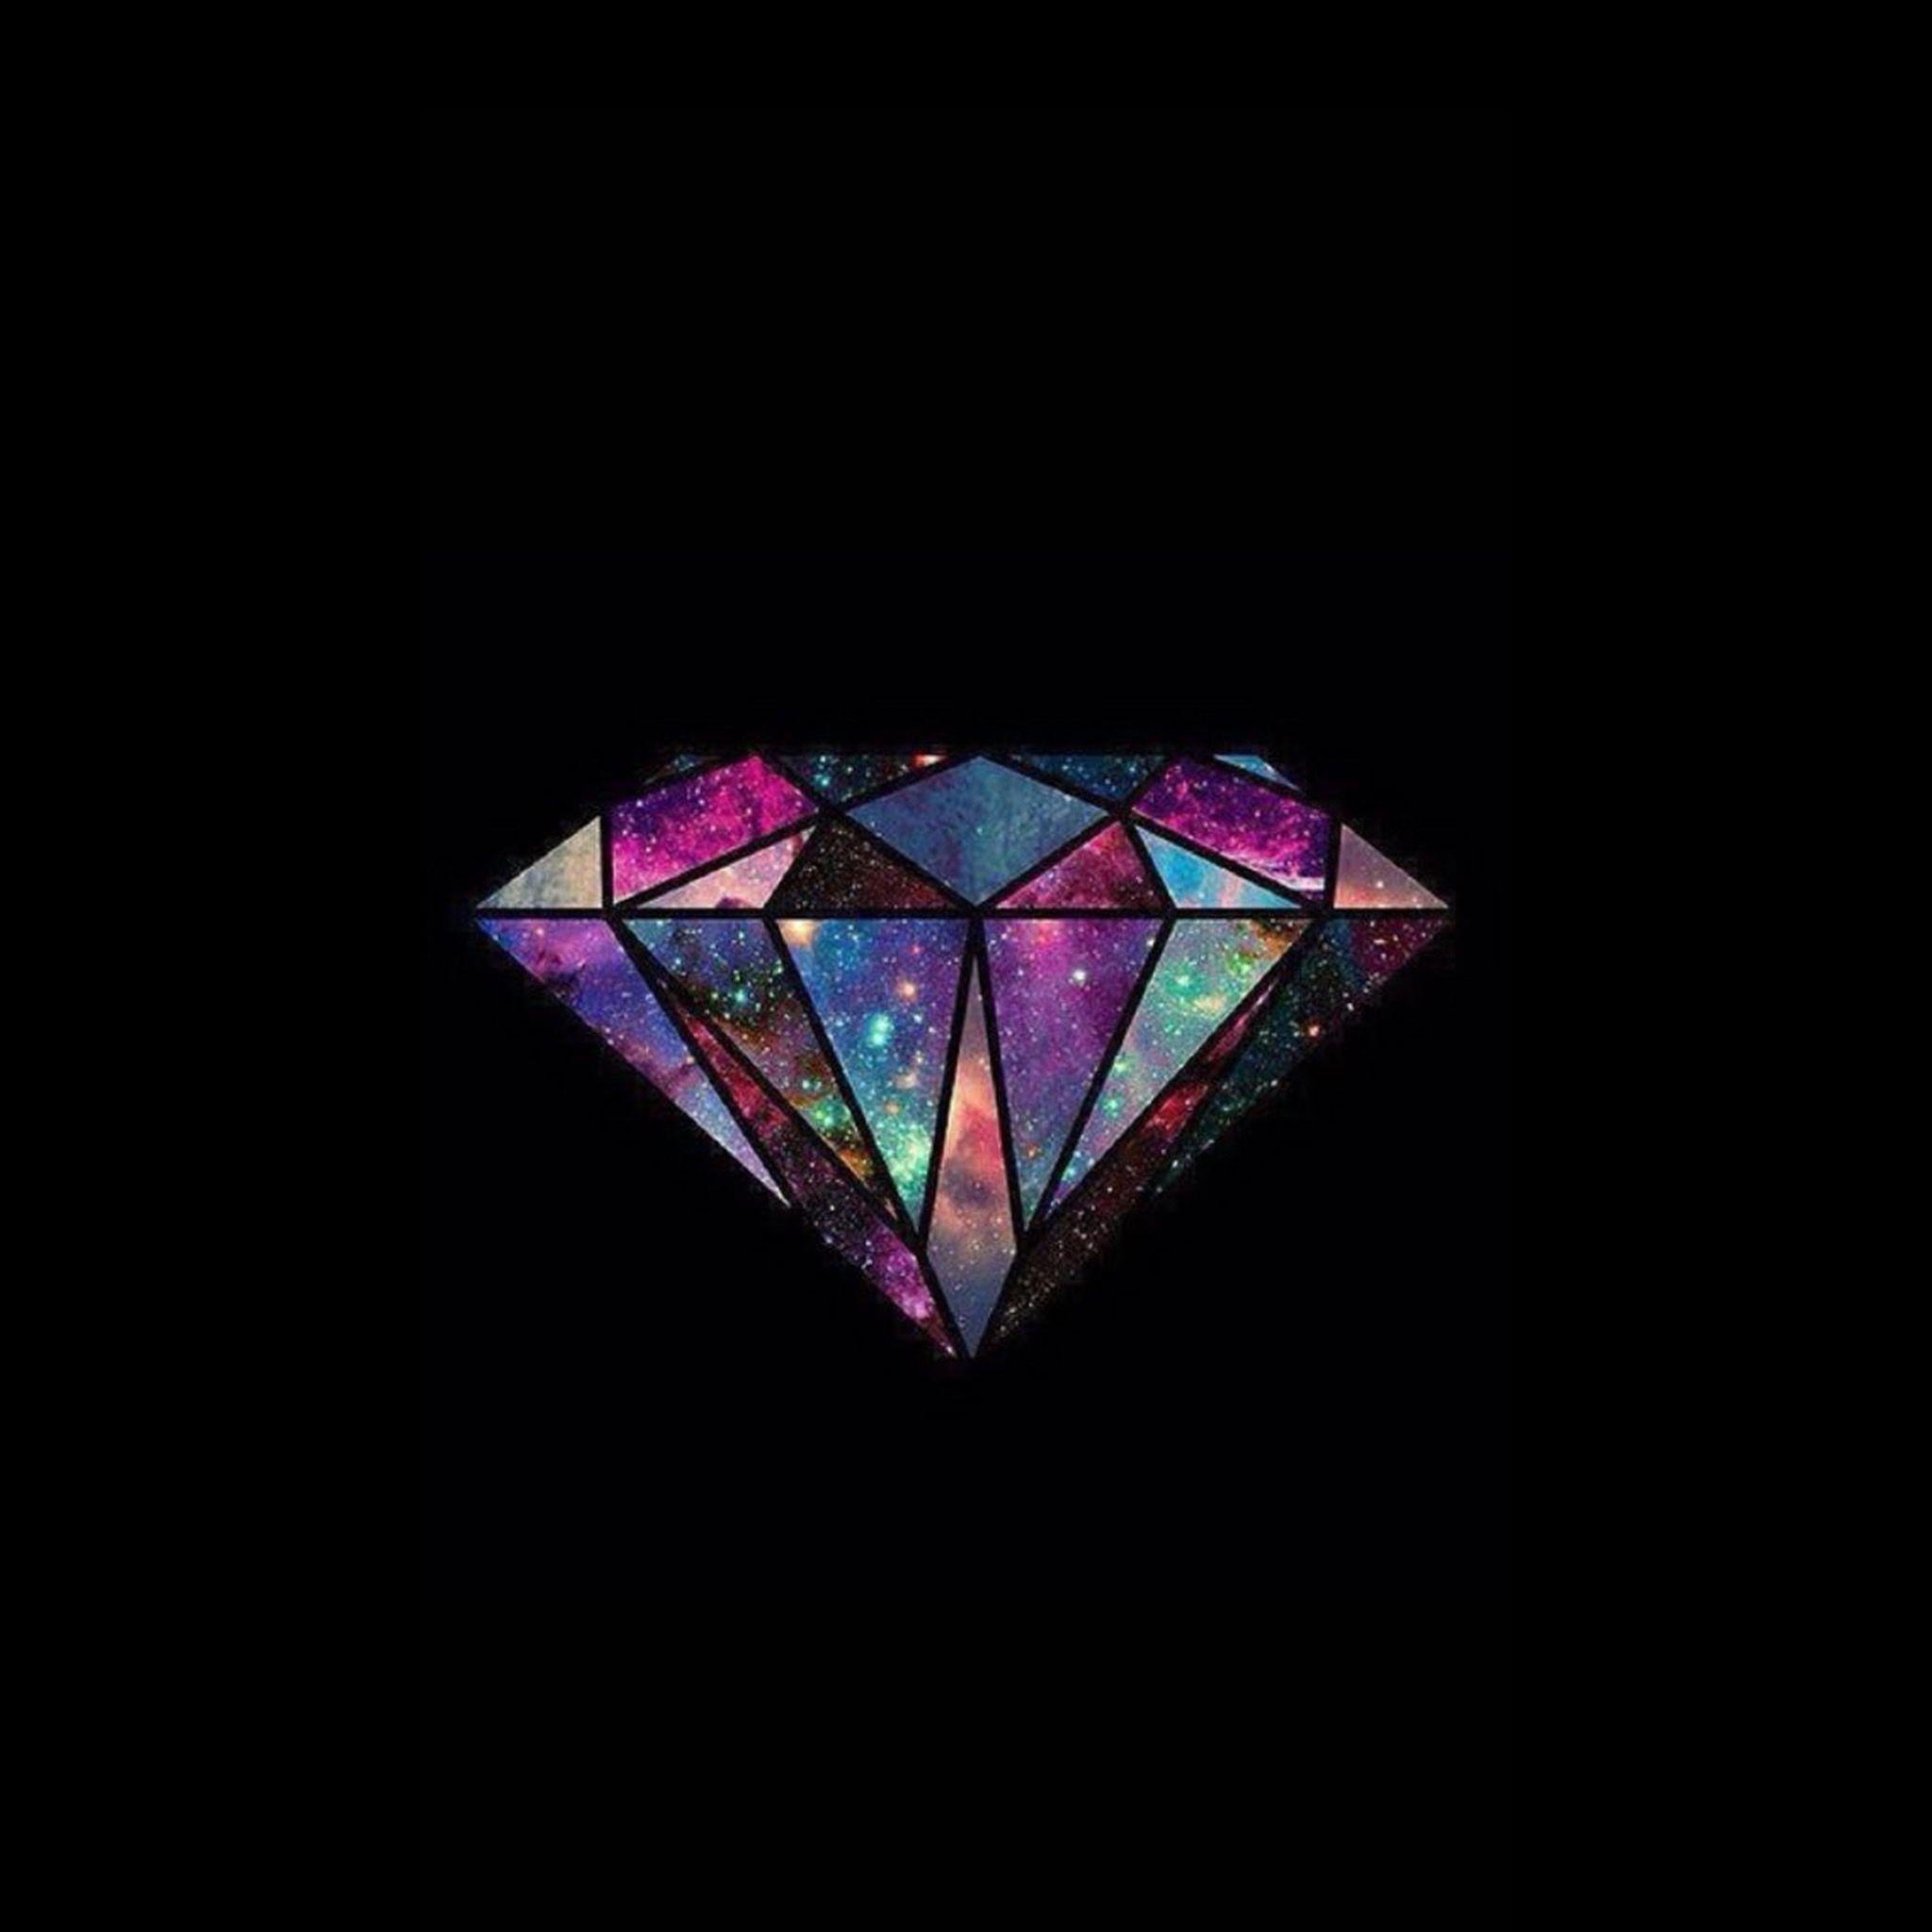 Galaxy diamond wallpaper WALPAPERS Pinterest Diamond